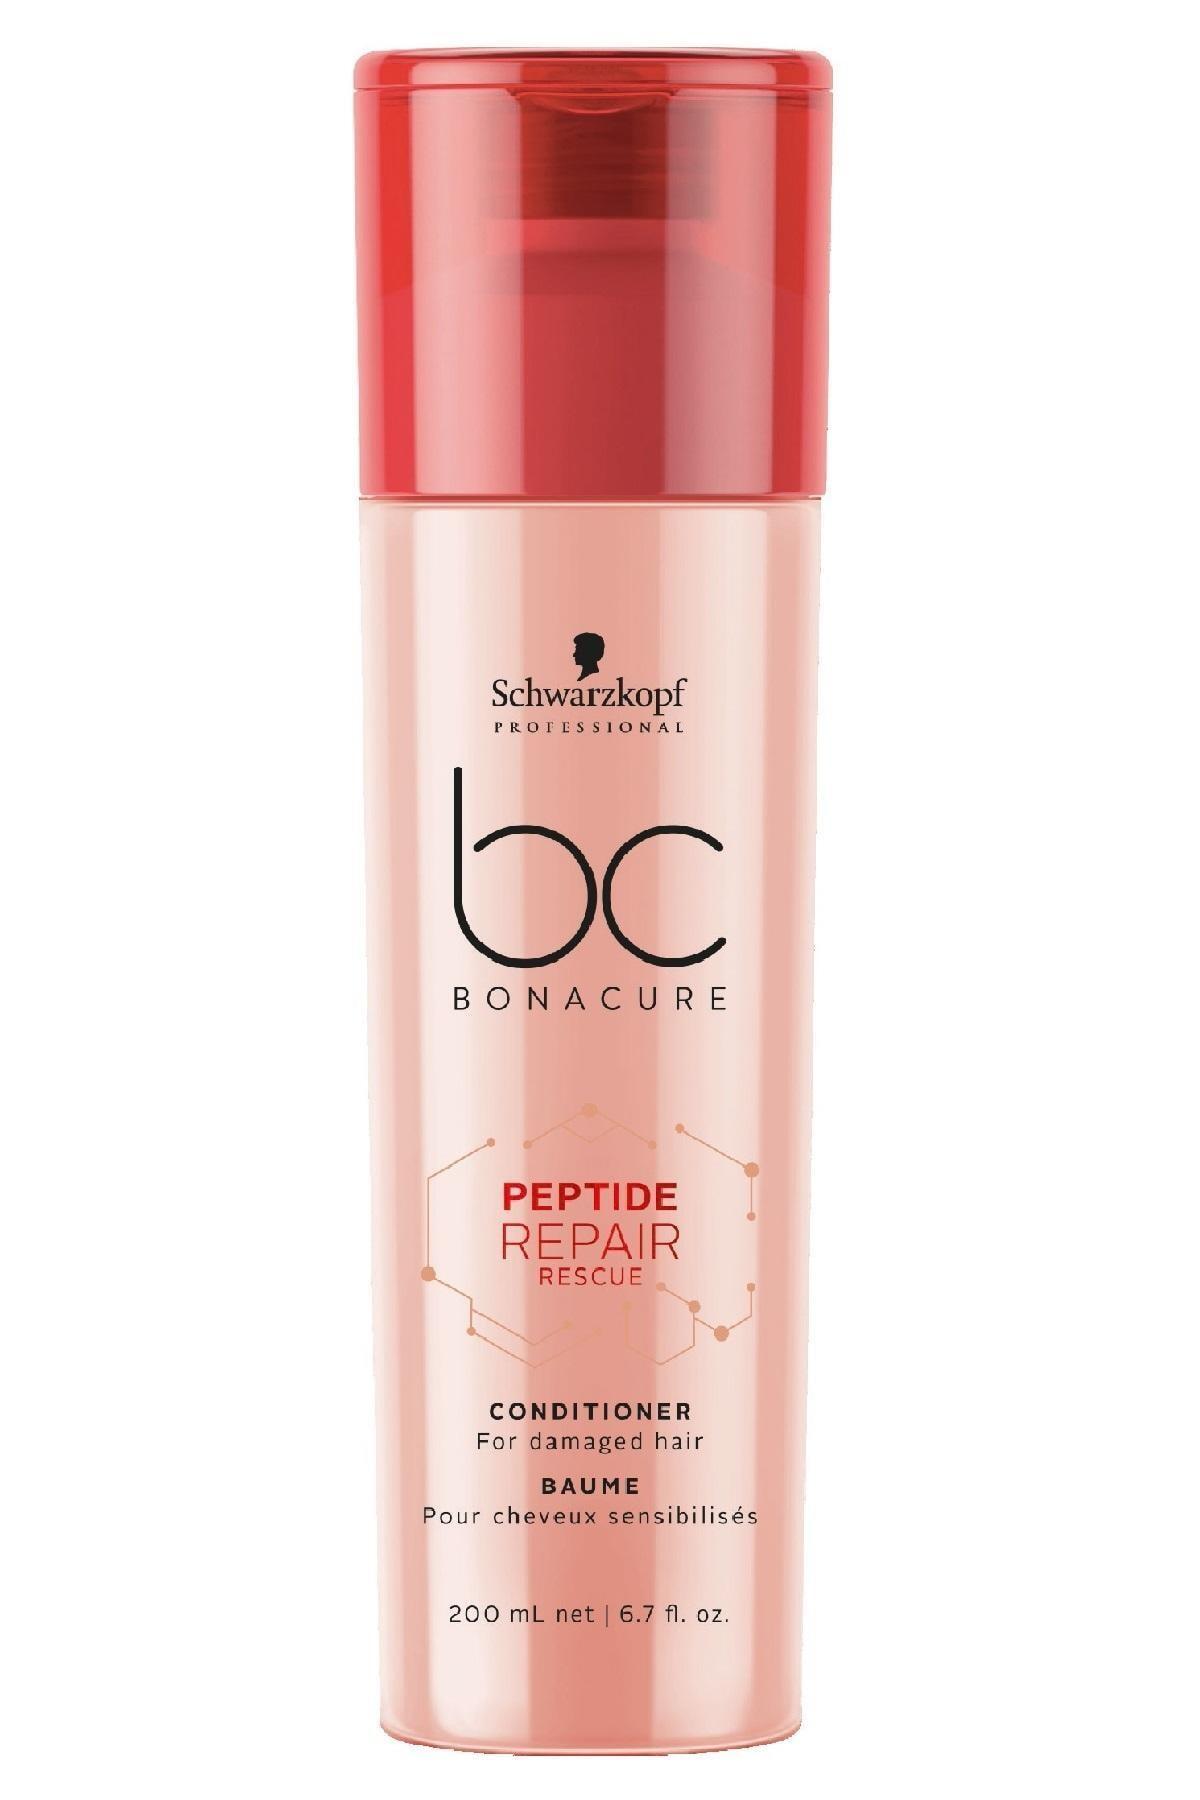 Bonacure Bc Peptide Acil Kurtarma Saç Kremi 200 ml 1